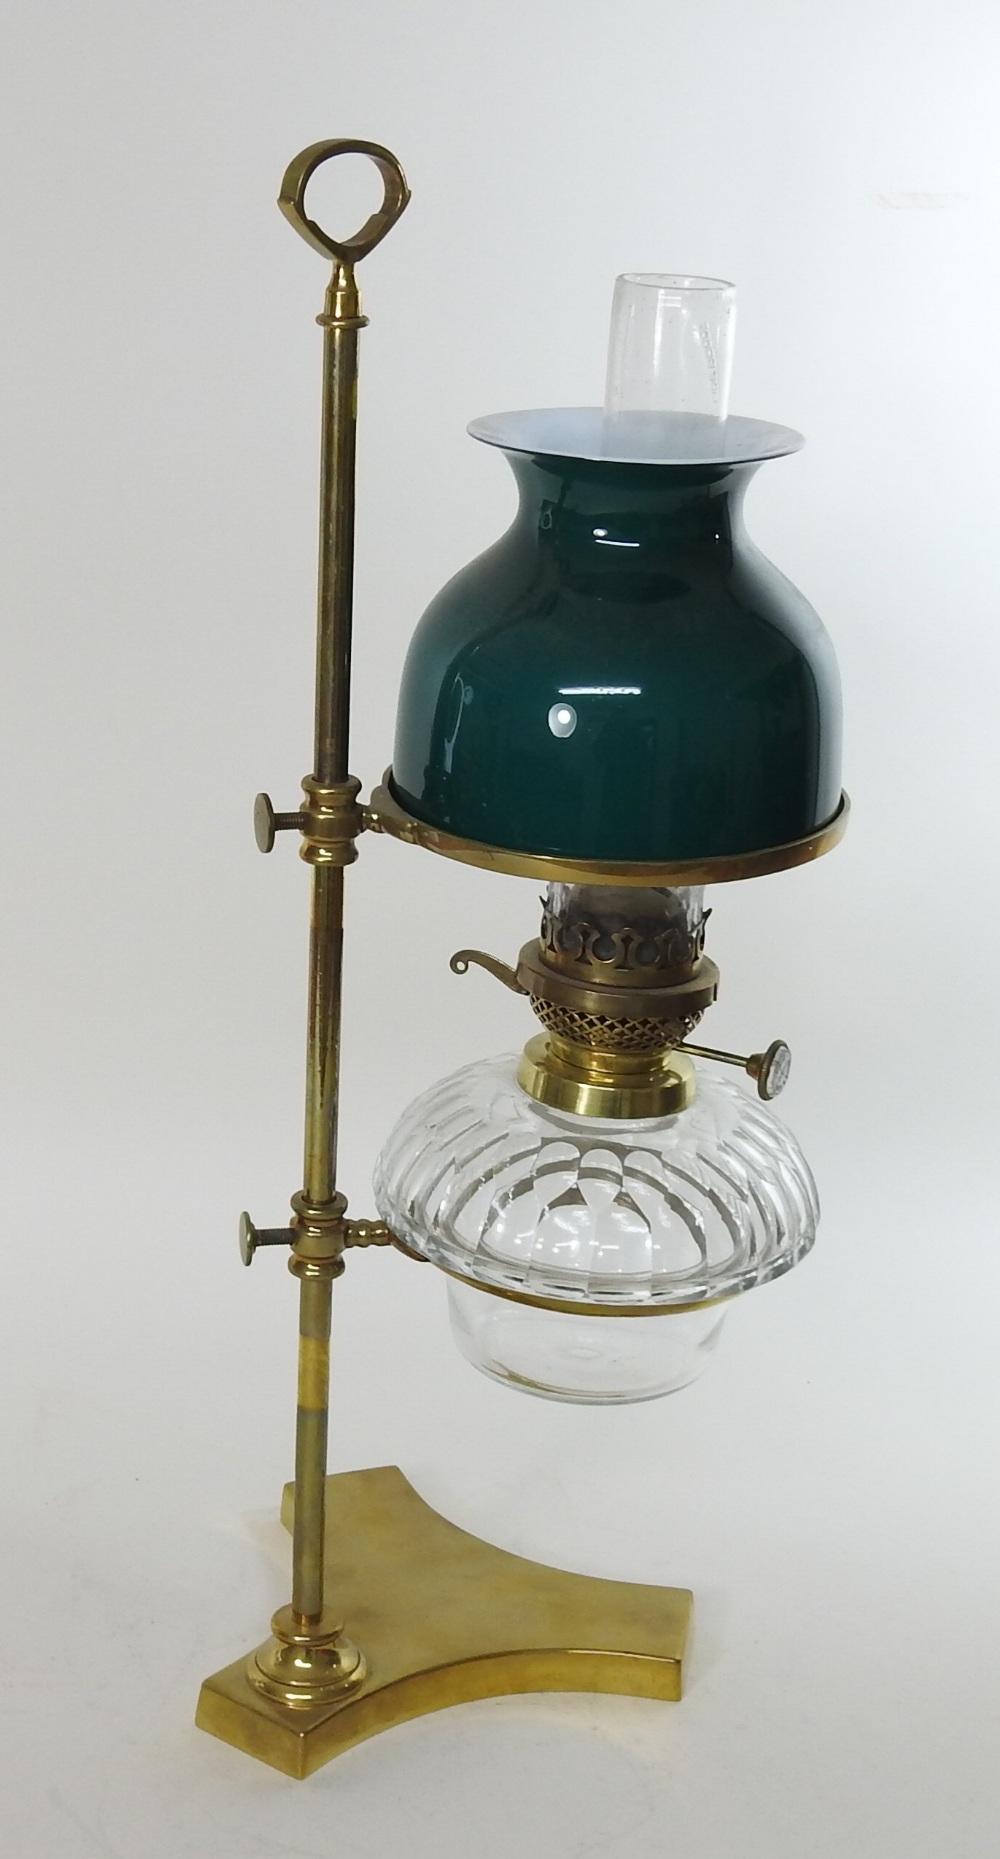 Lot 35 - A Victorian Hinks & Son Ltd patent brass student's lamp,